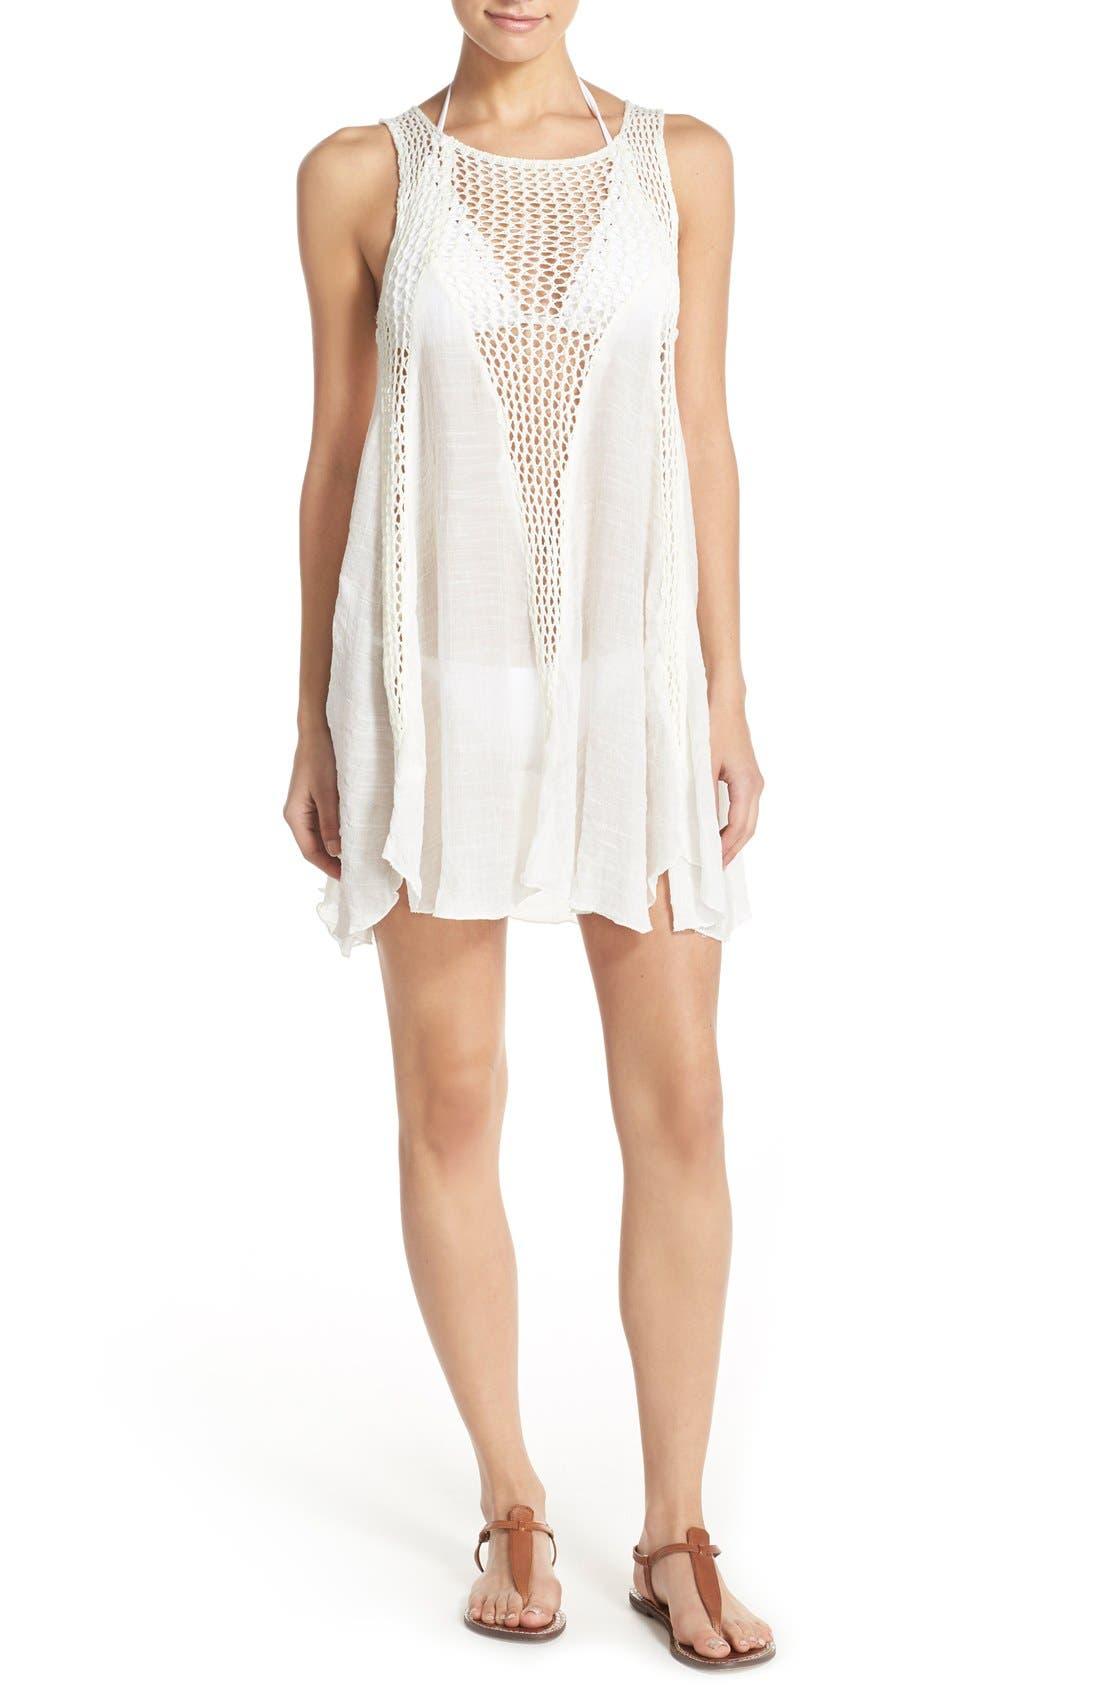 Alternate Image 1 Selected - Elan Crochet Inset Cover-Up Dress